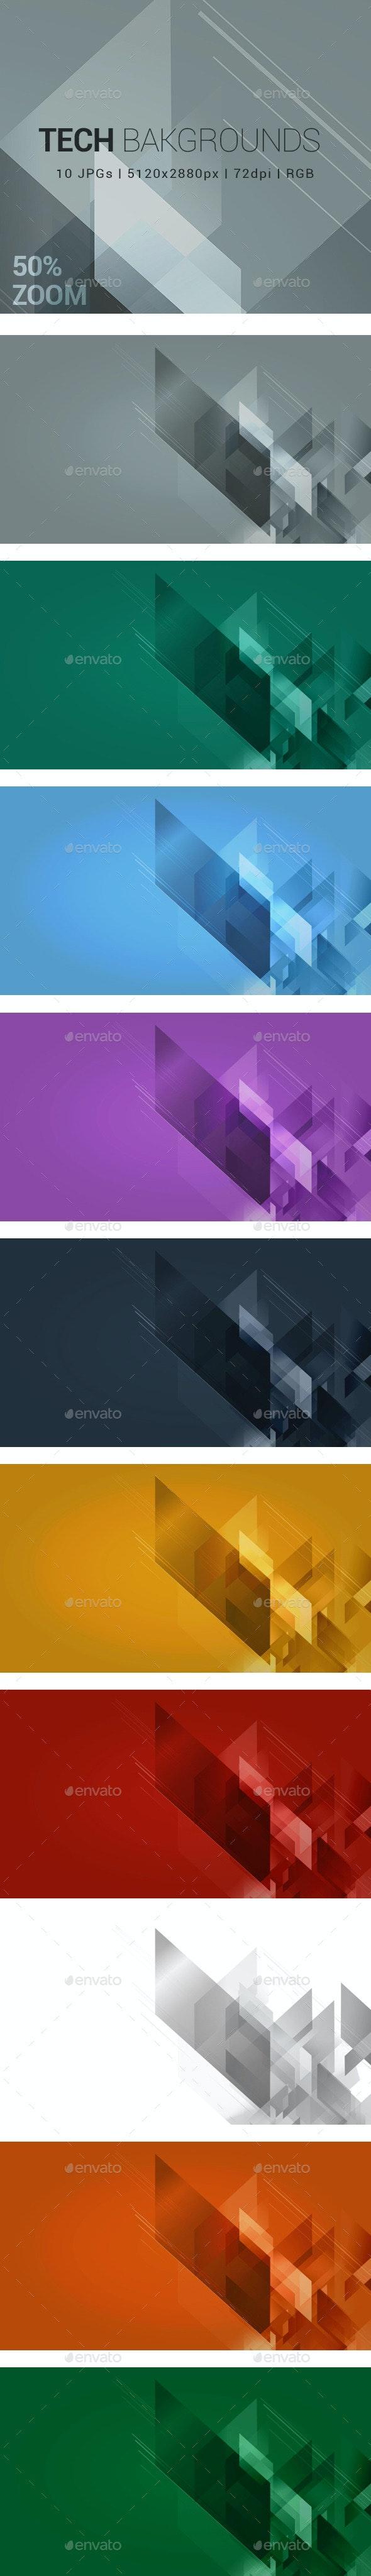 10 Tech Backgrounds - Tech / Futuristic Backgrounds